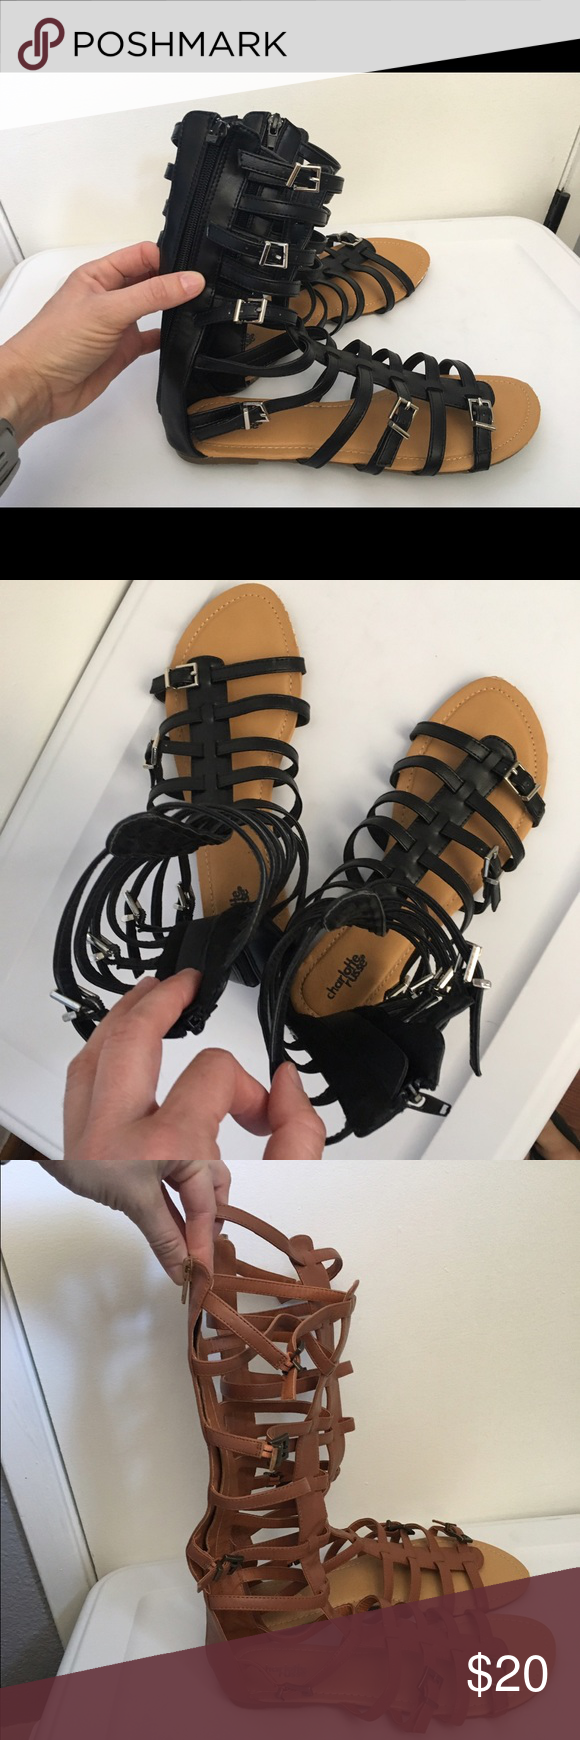 Charlotte Russe Gladiator Sandals Black, like new, size 9. Charlotte Russe Shoes Sandals